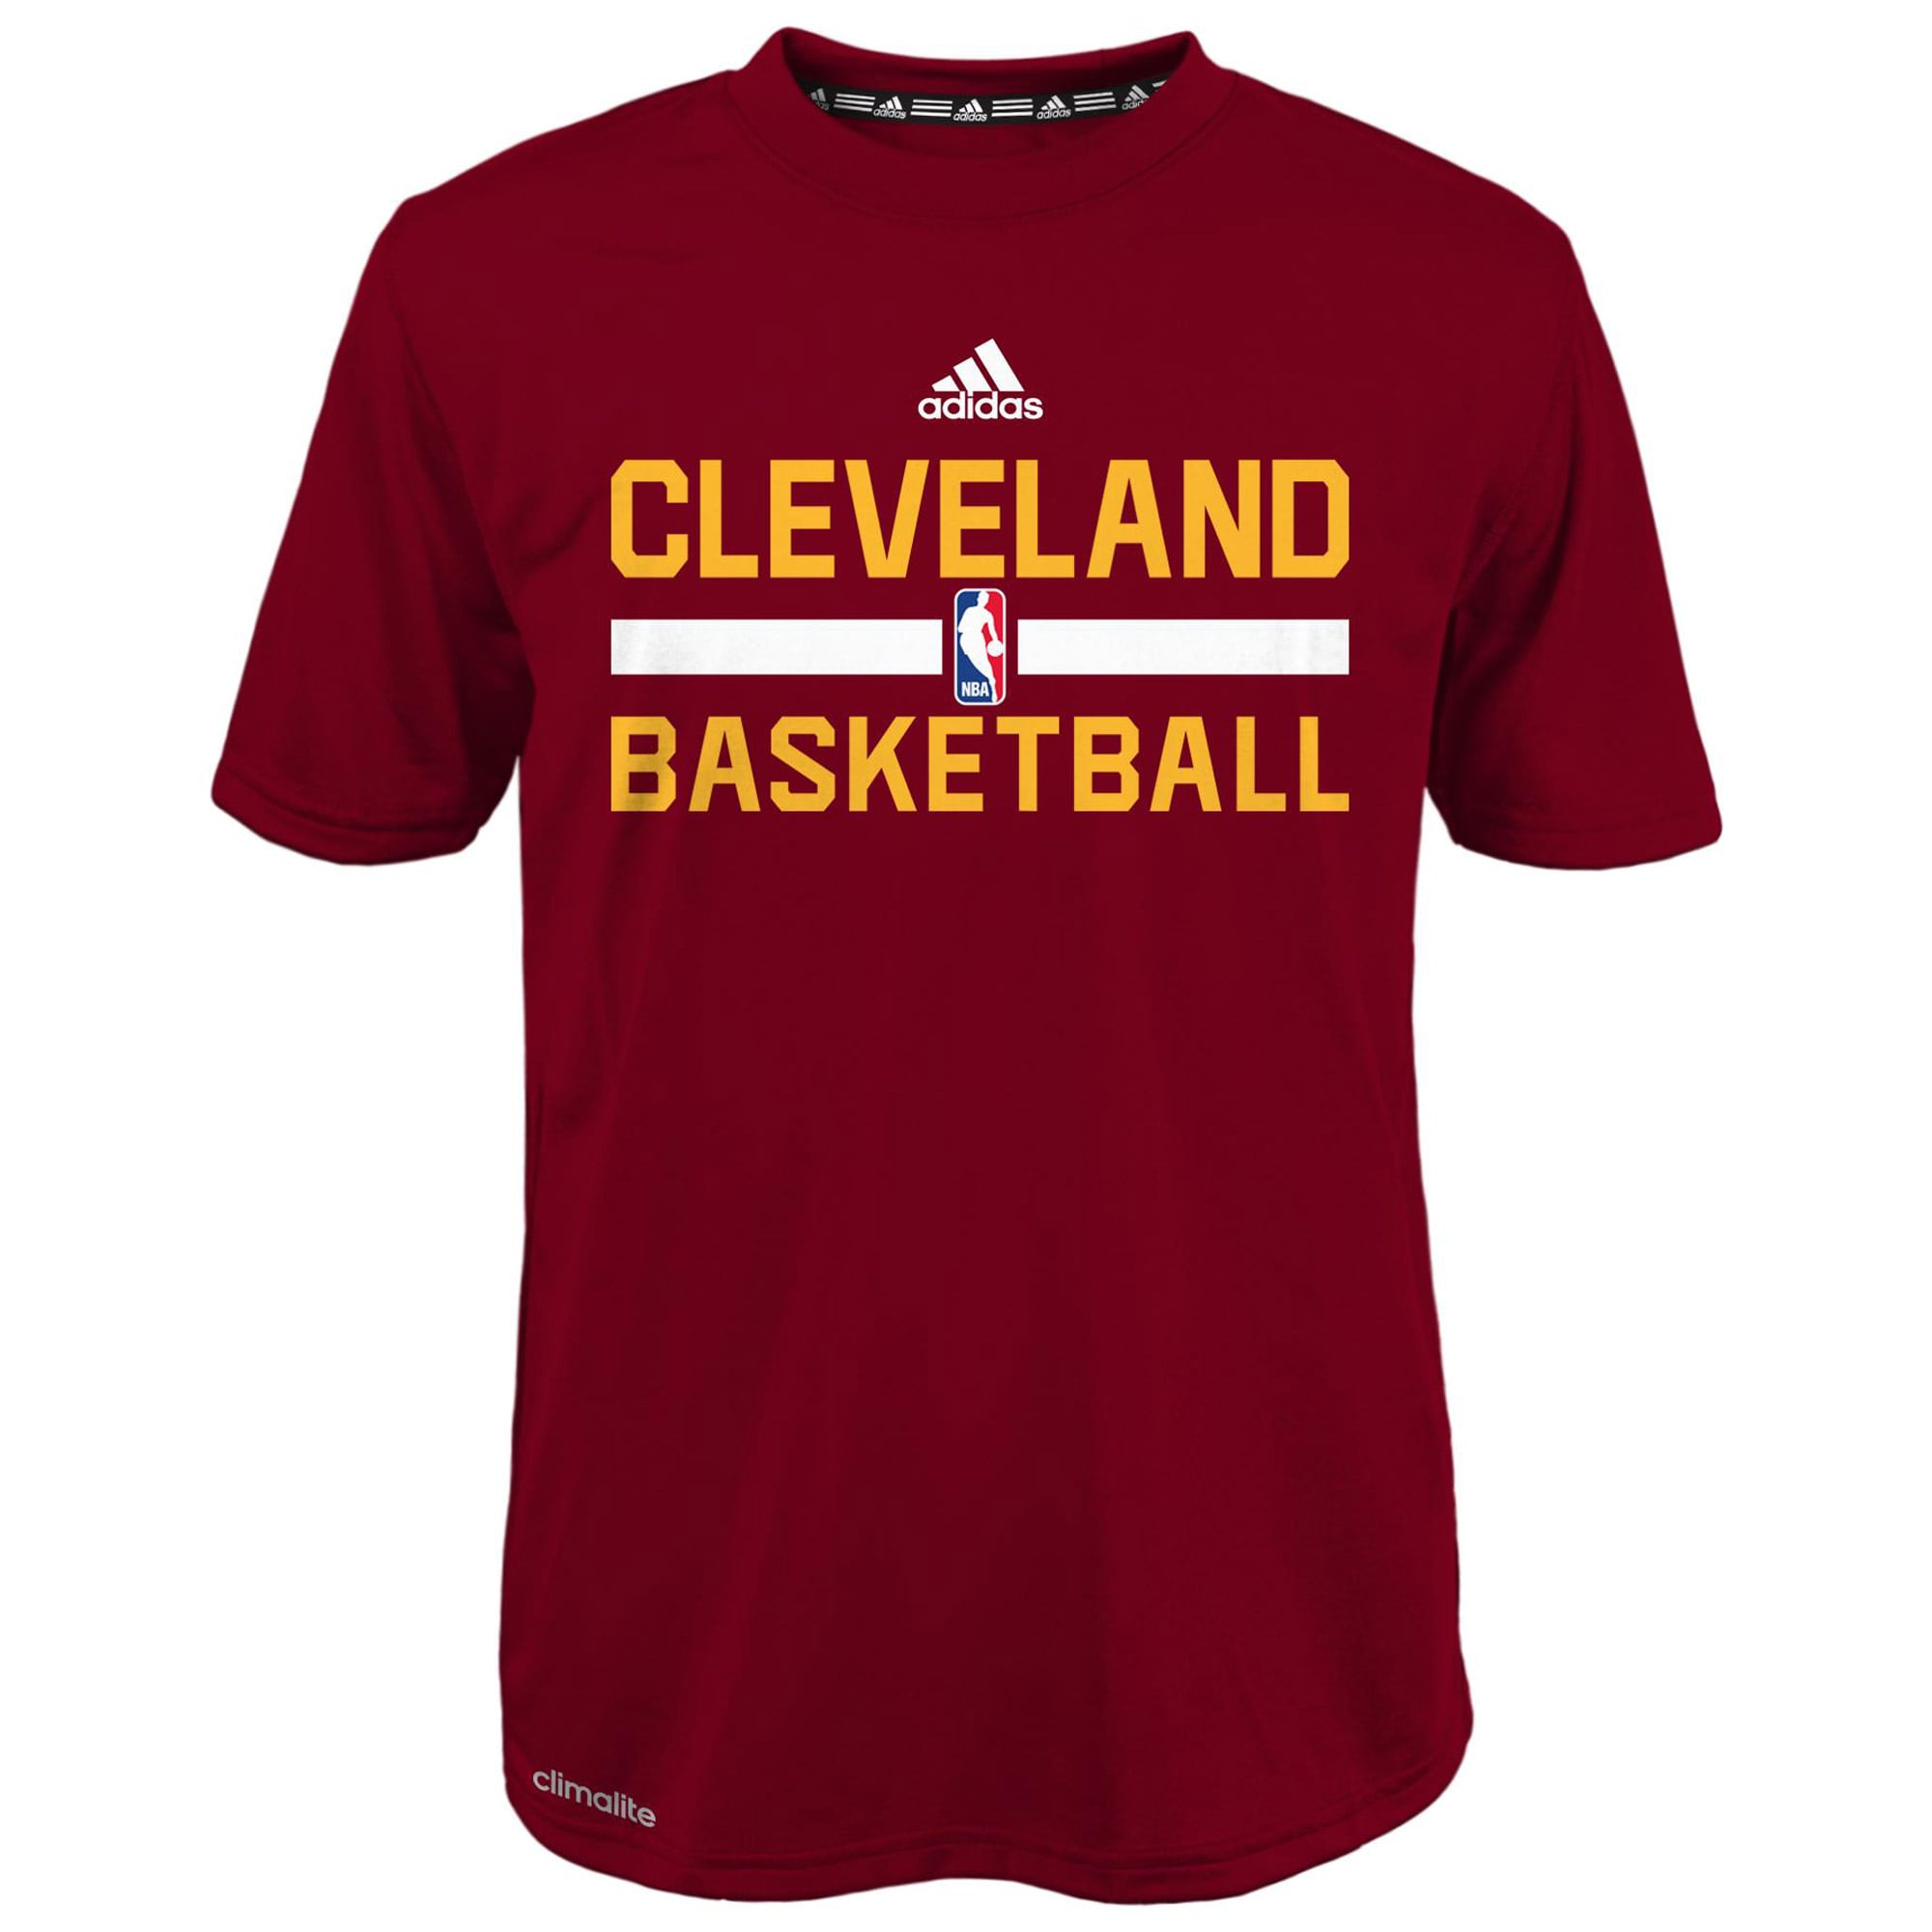 Cleveland Cavaliers adidas Youth Practice Wear Performance T-Shirt - Garnet